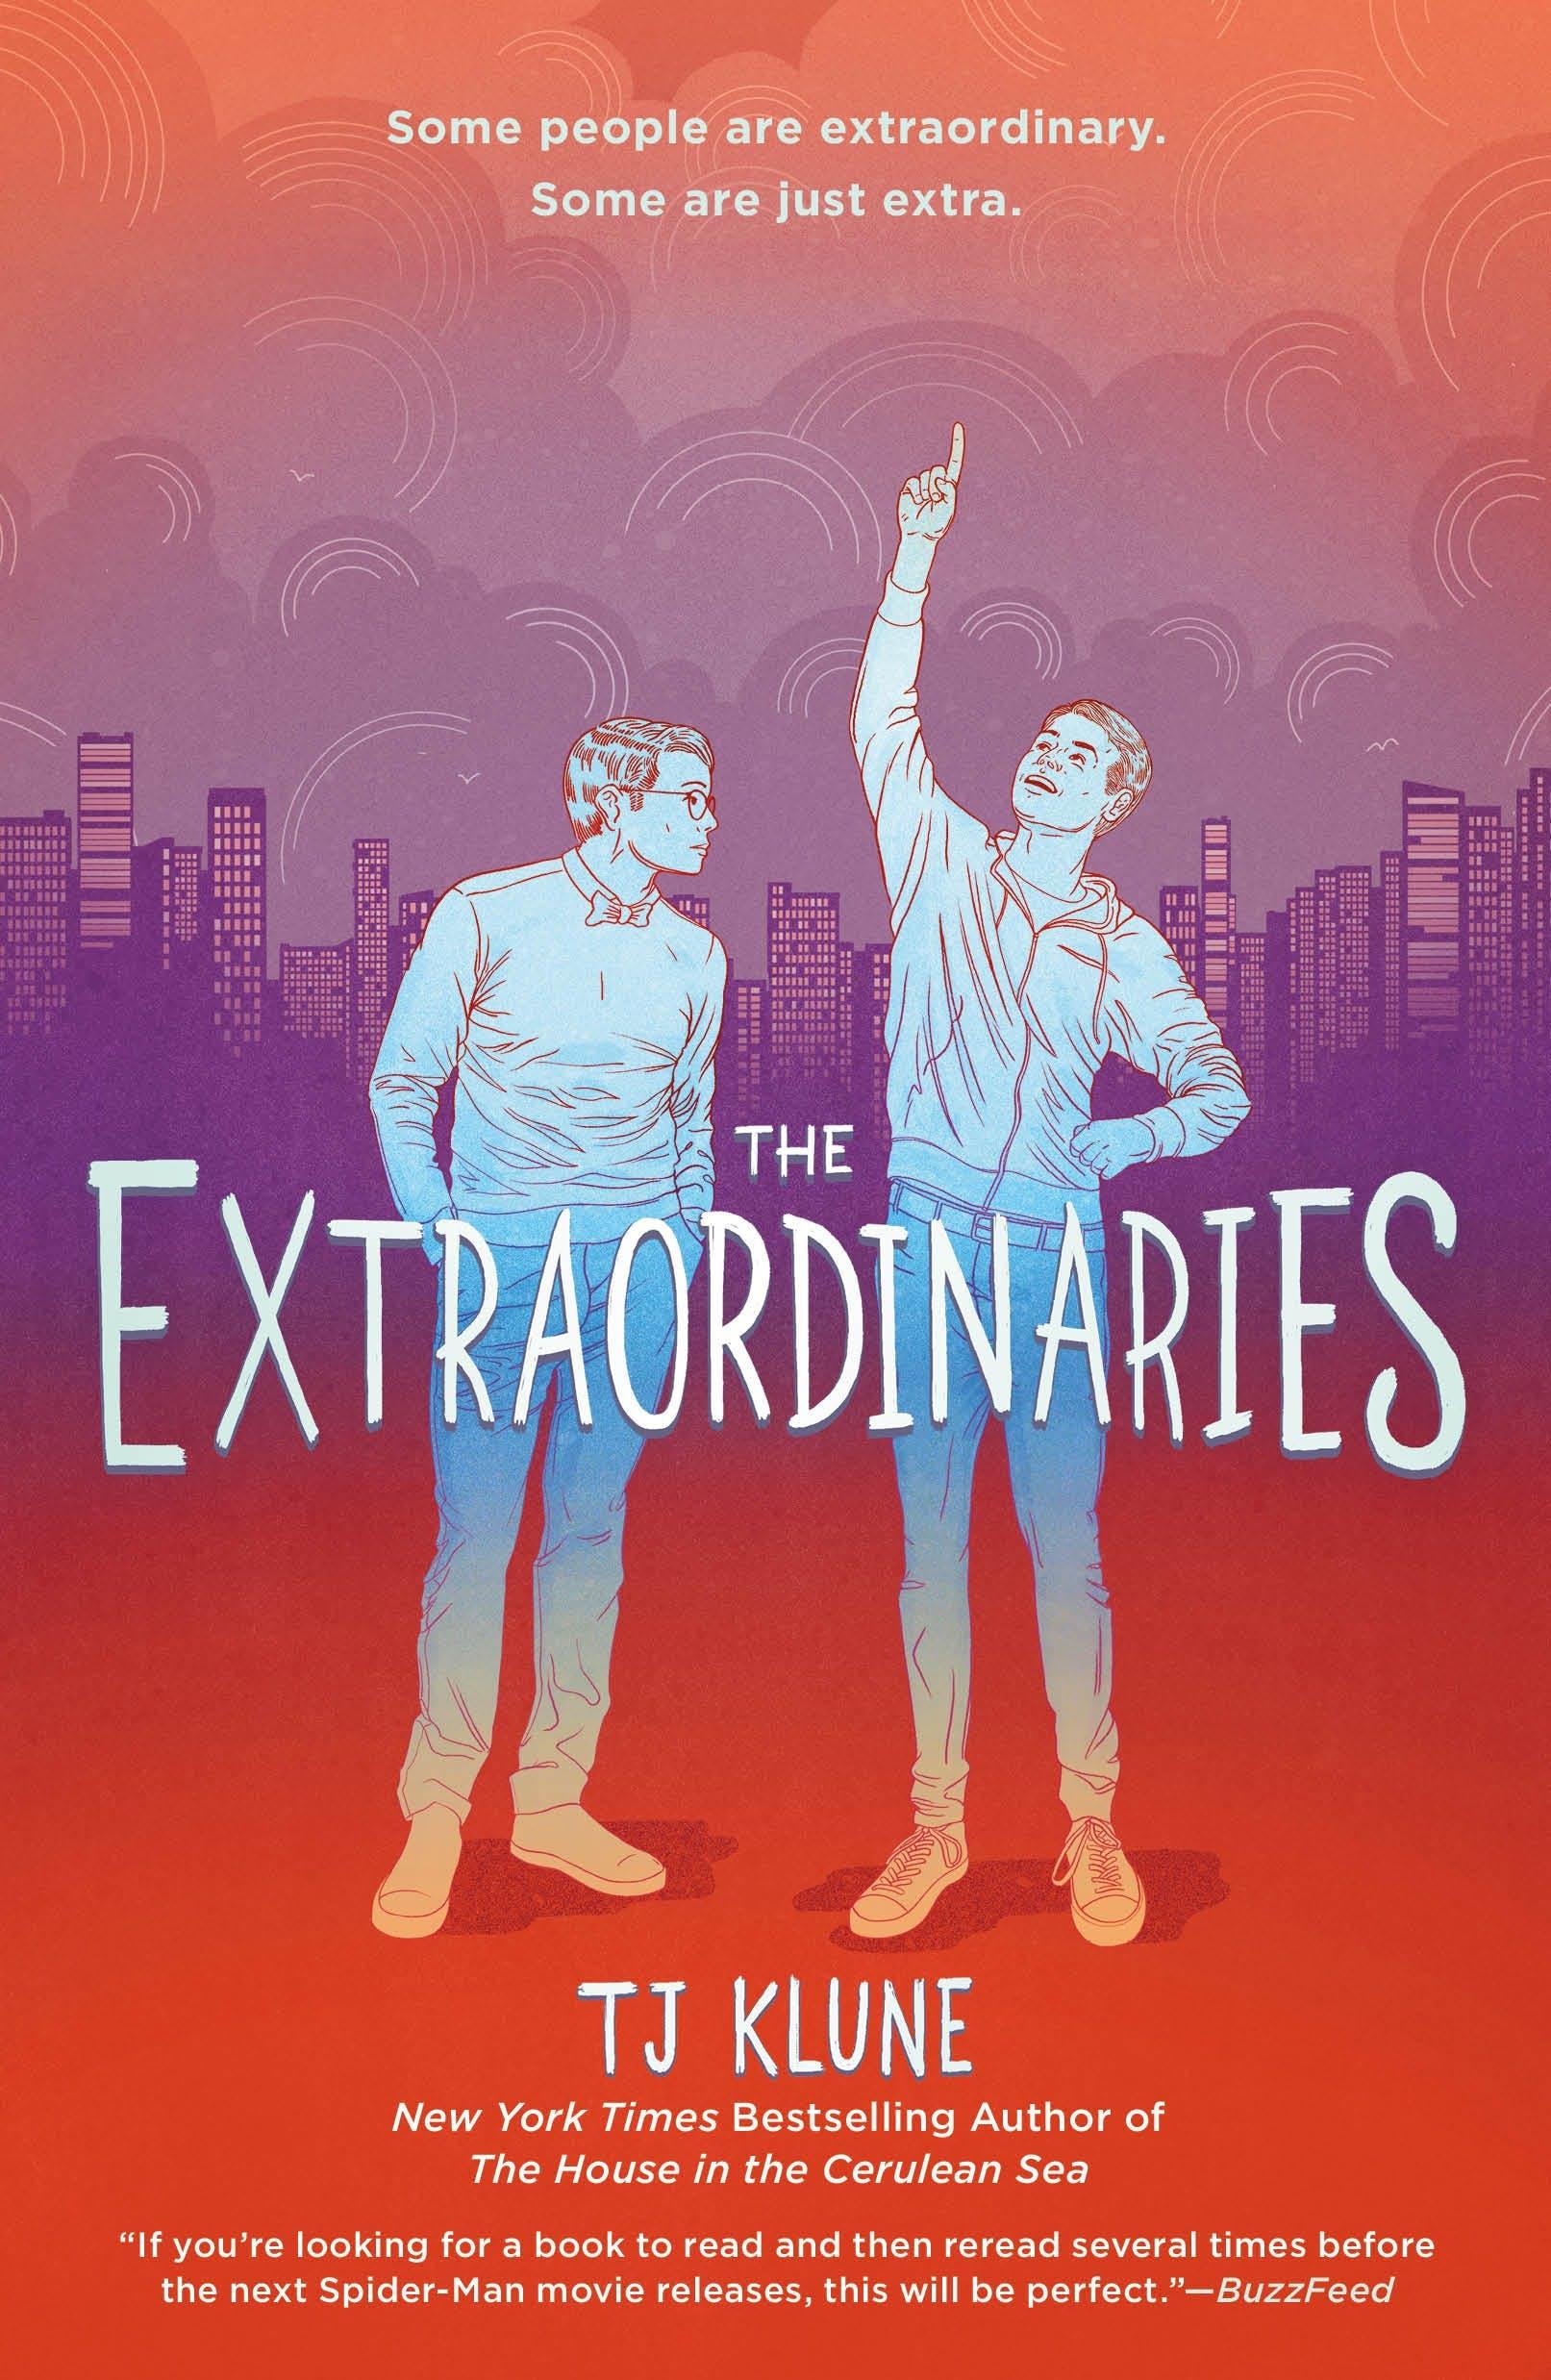 Image of The Extraordinaries